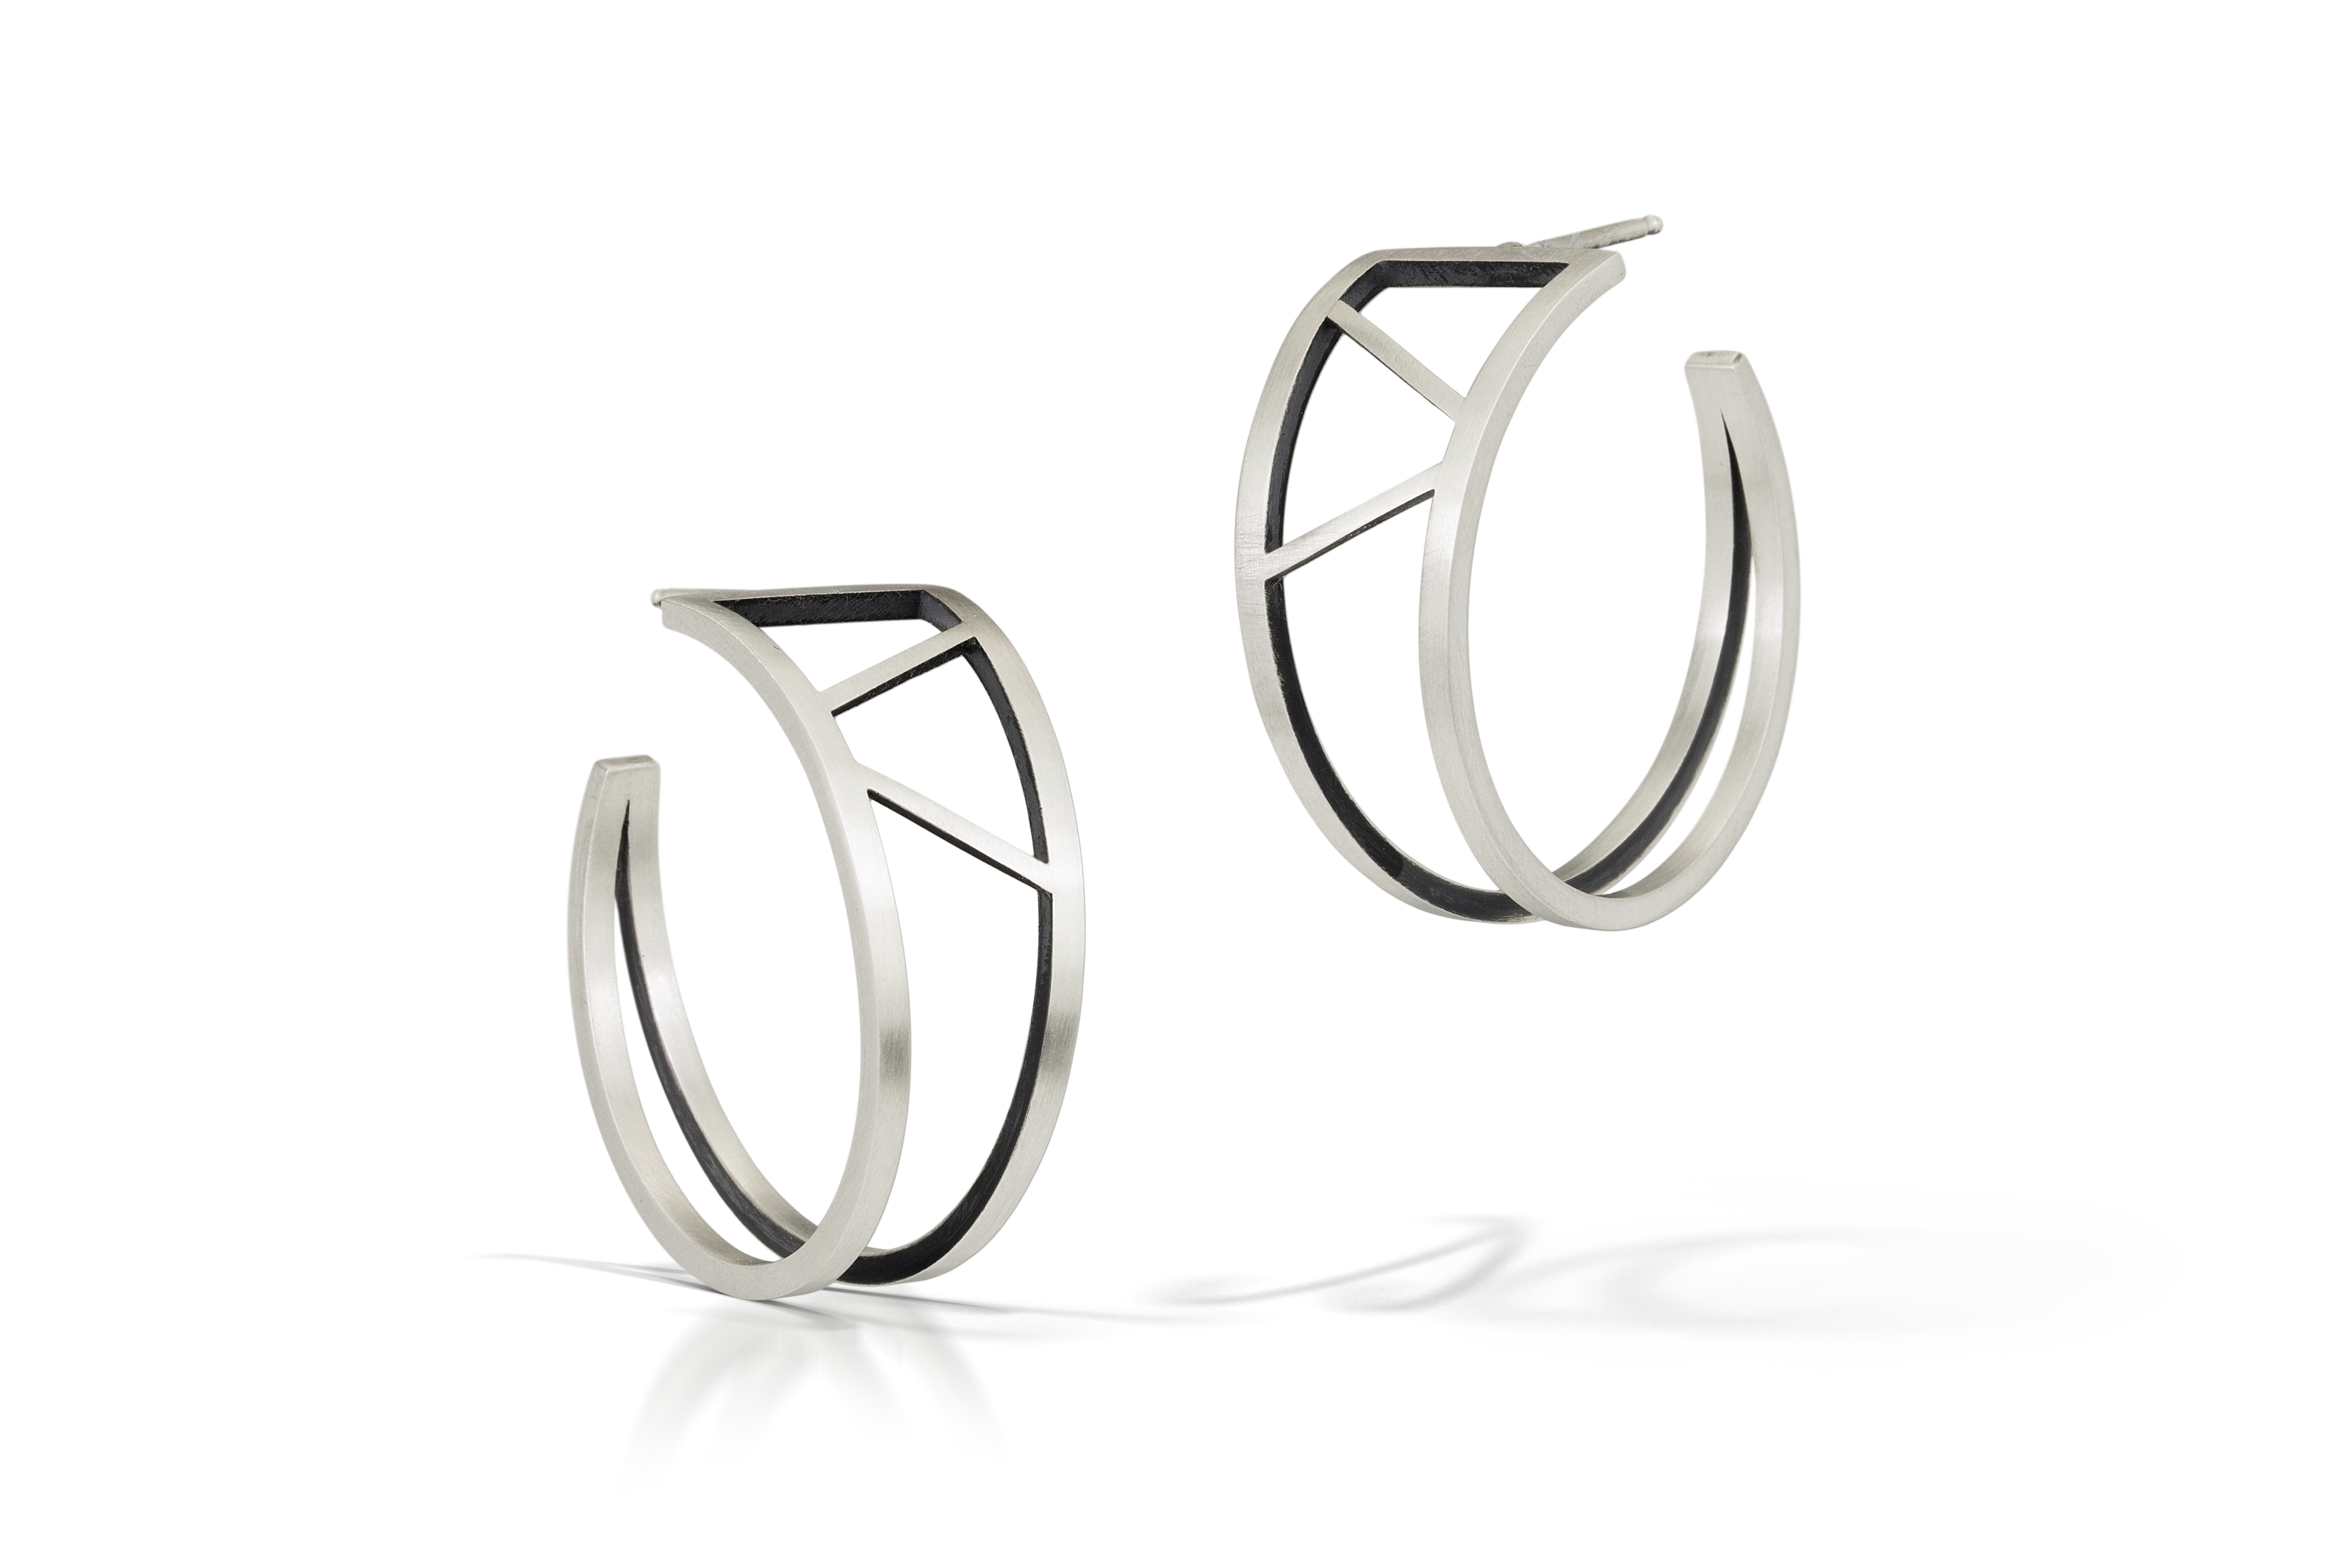 Earrings by Emily Shaffer Studio